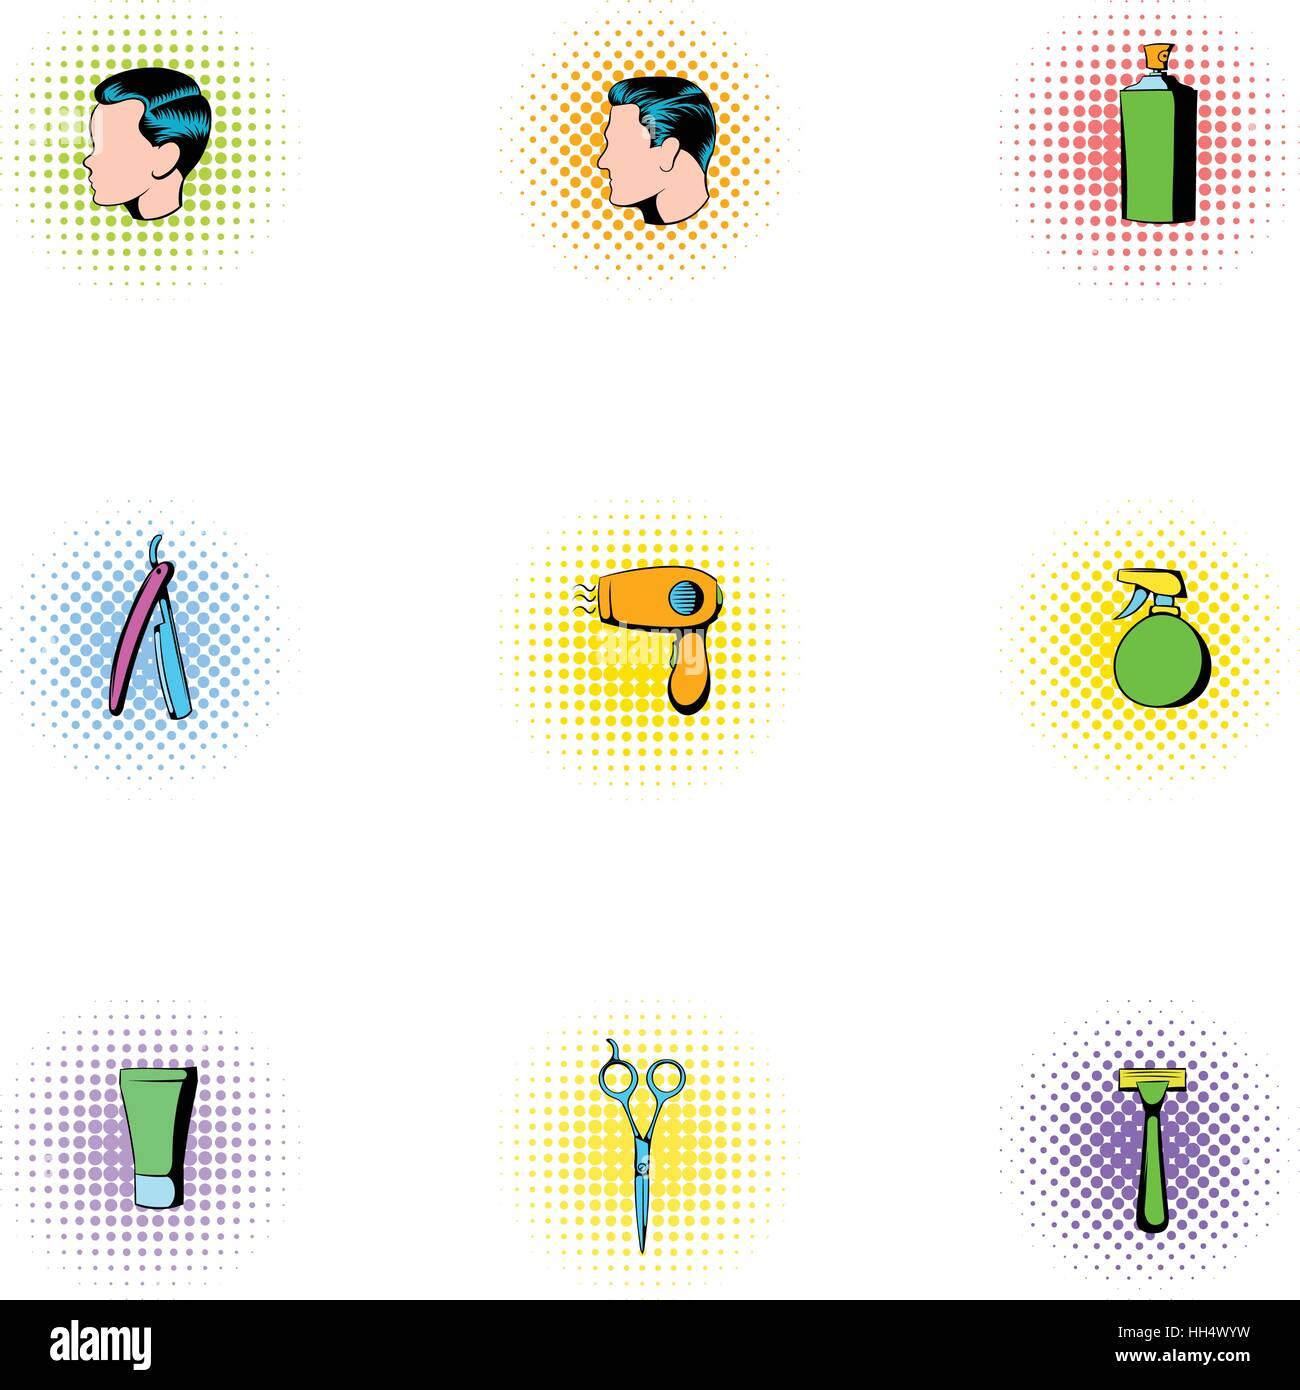 Hair cut icons set, pop-art style - Stock Image